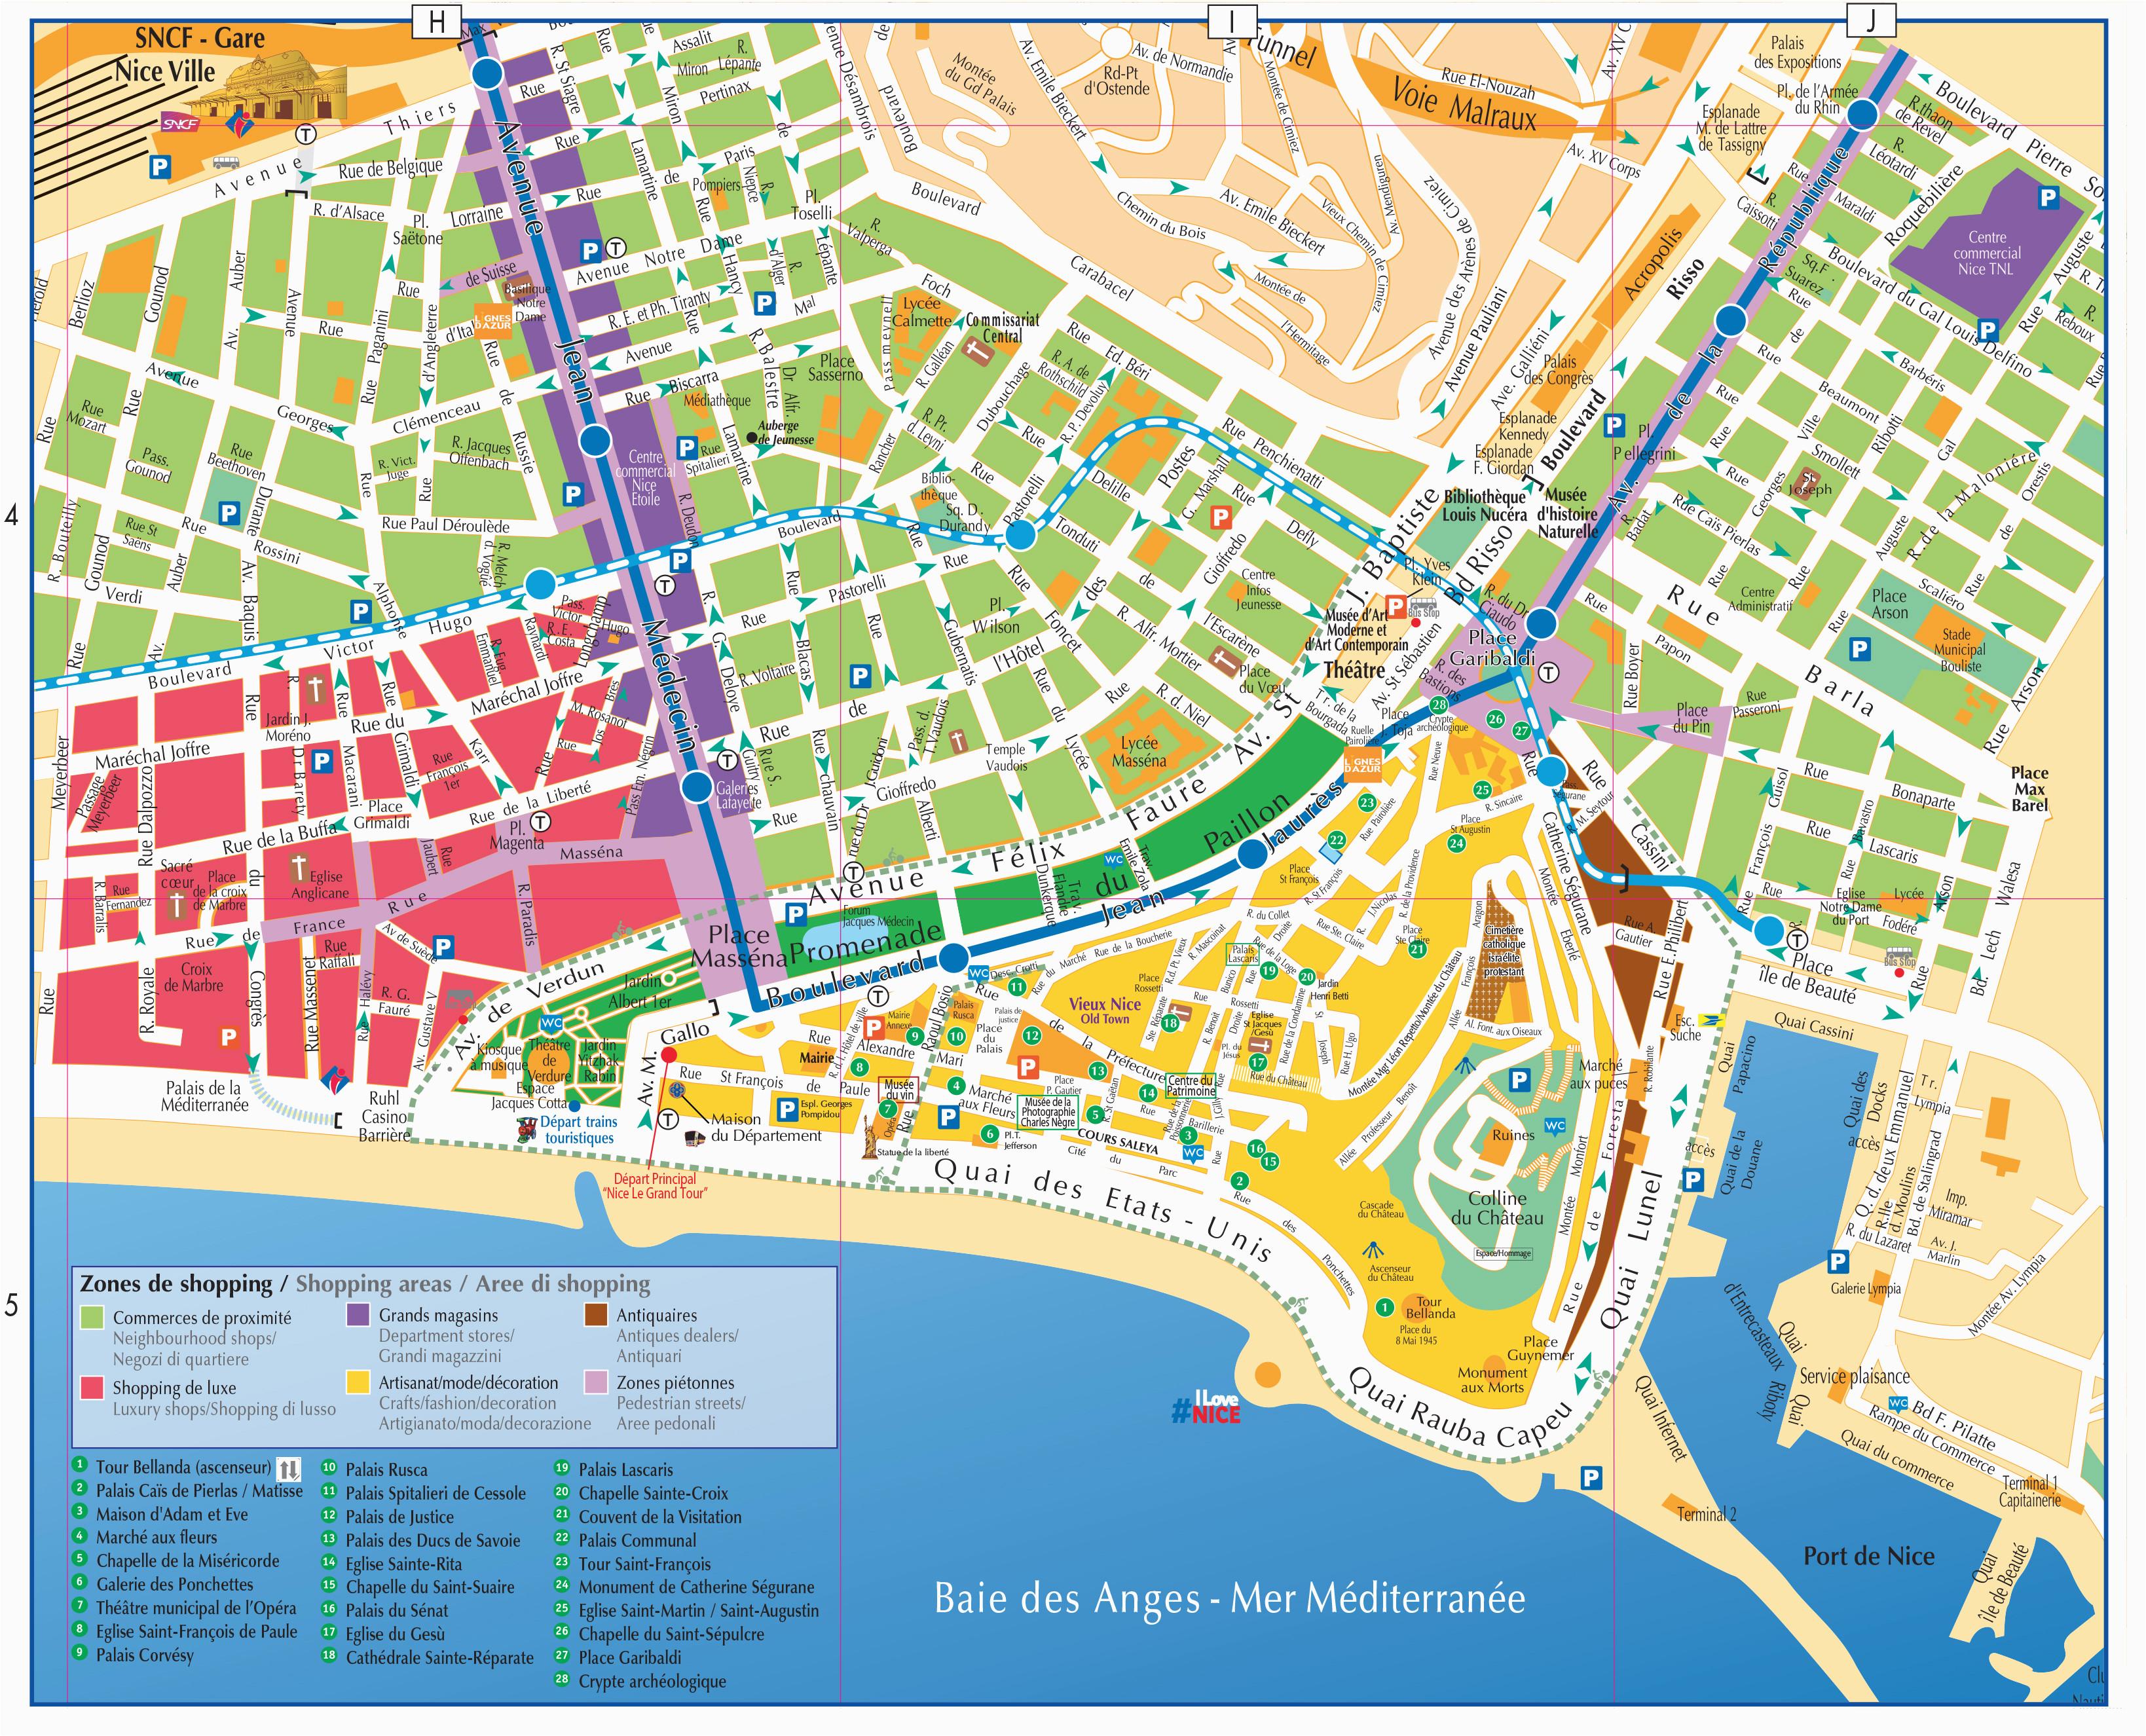 maps and brochures of nice ca te d azur